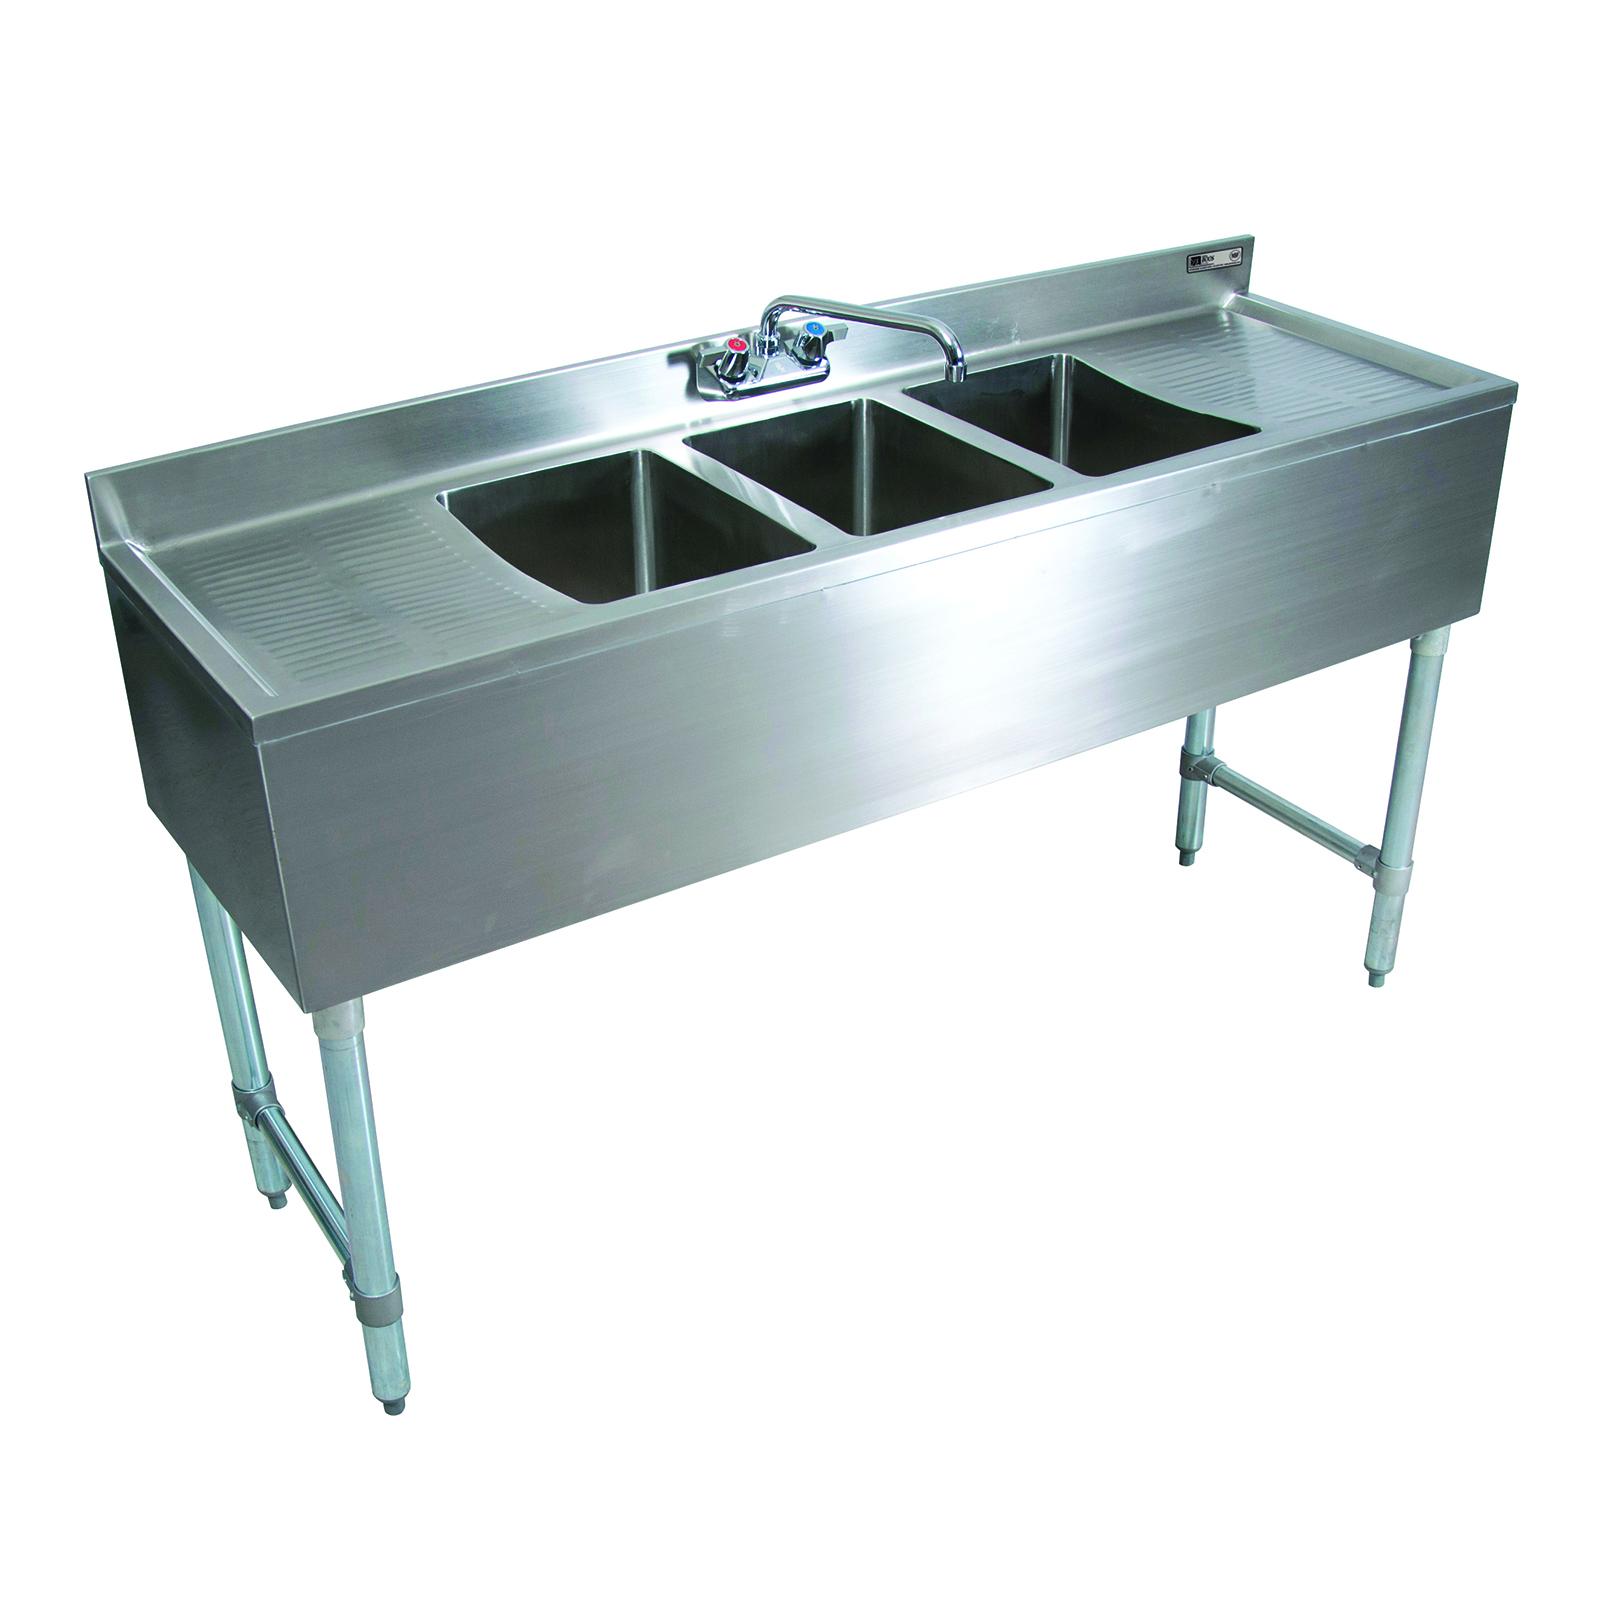 John Boos EUB3S96SL-2D underbar sink units